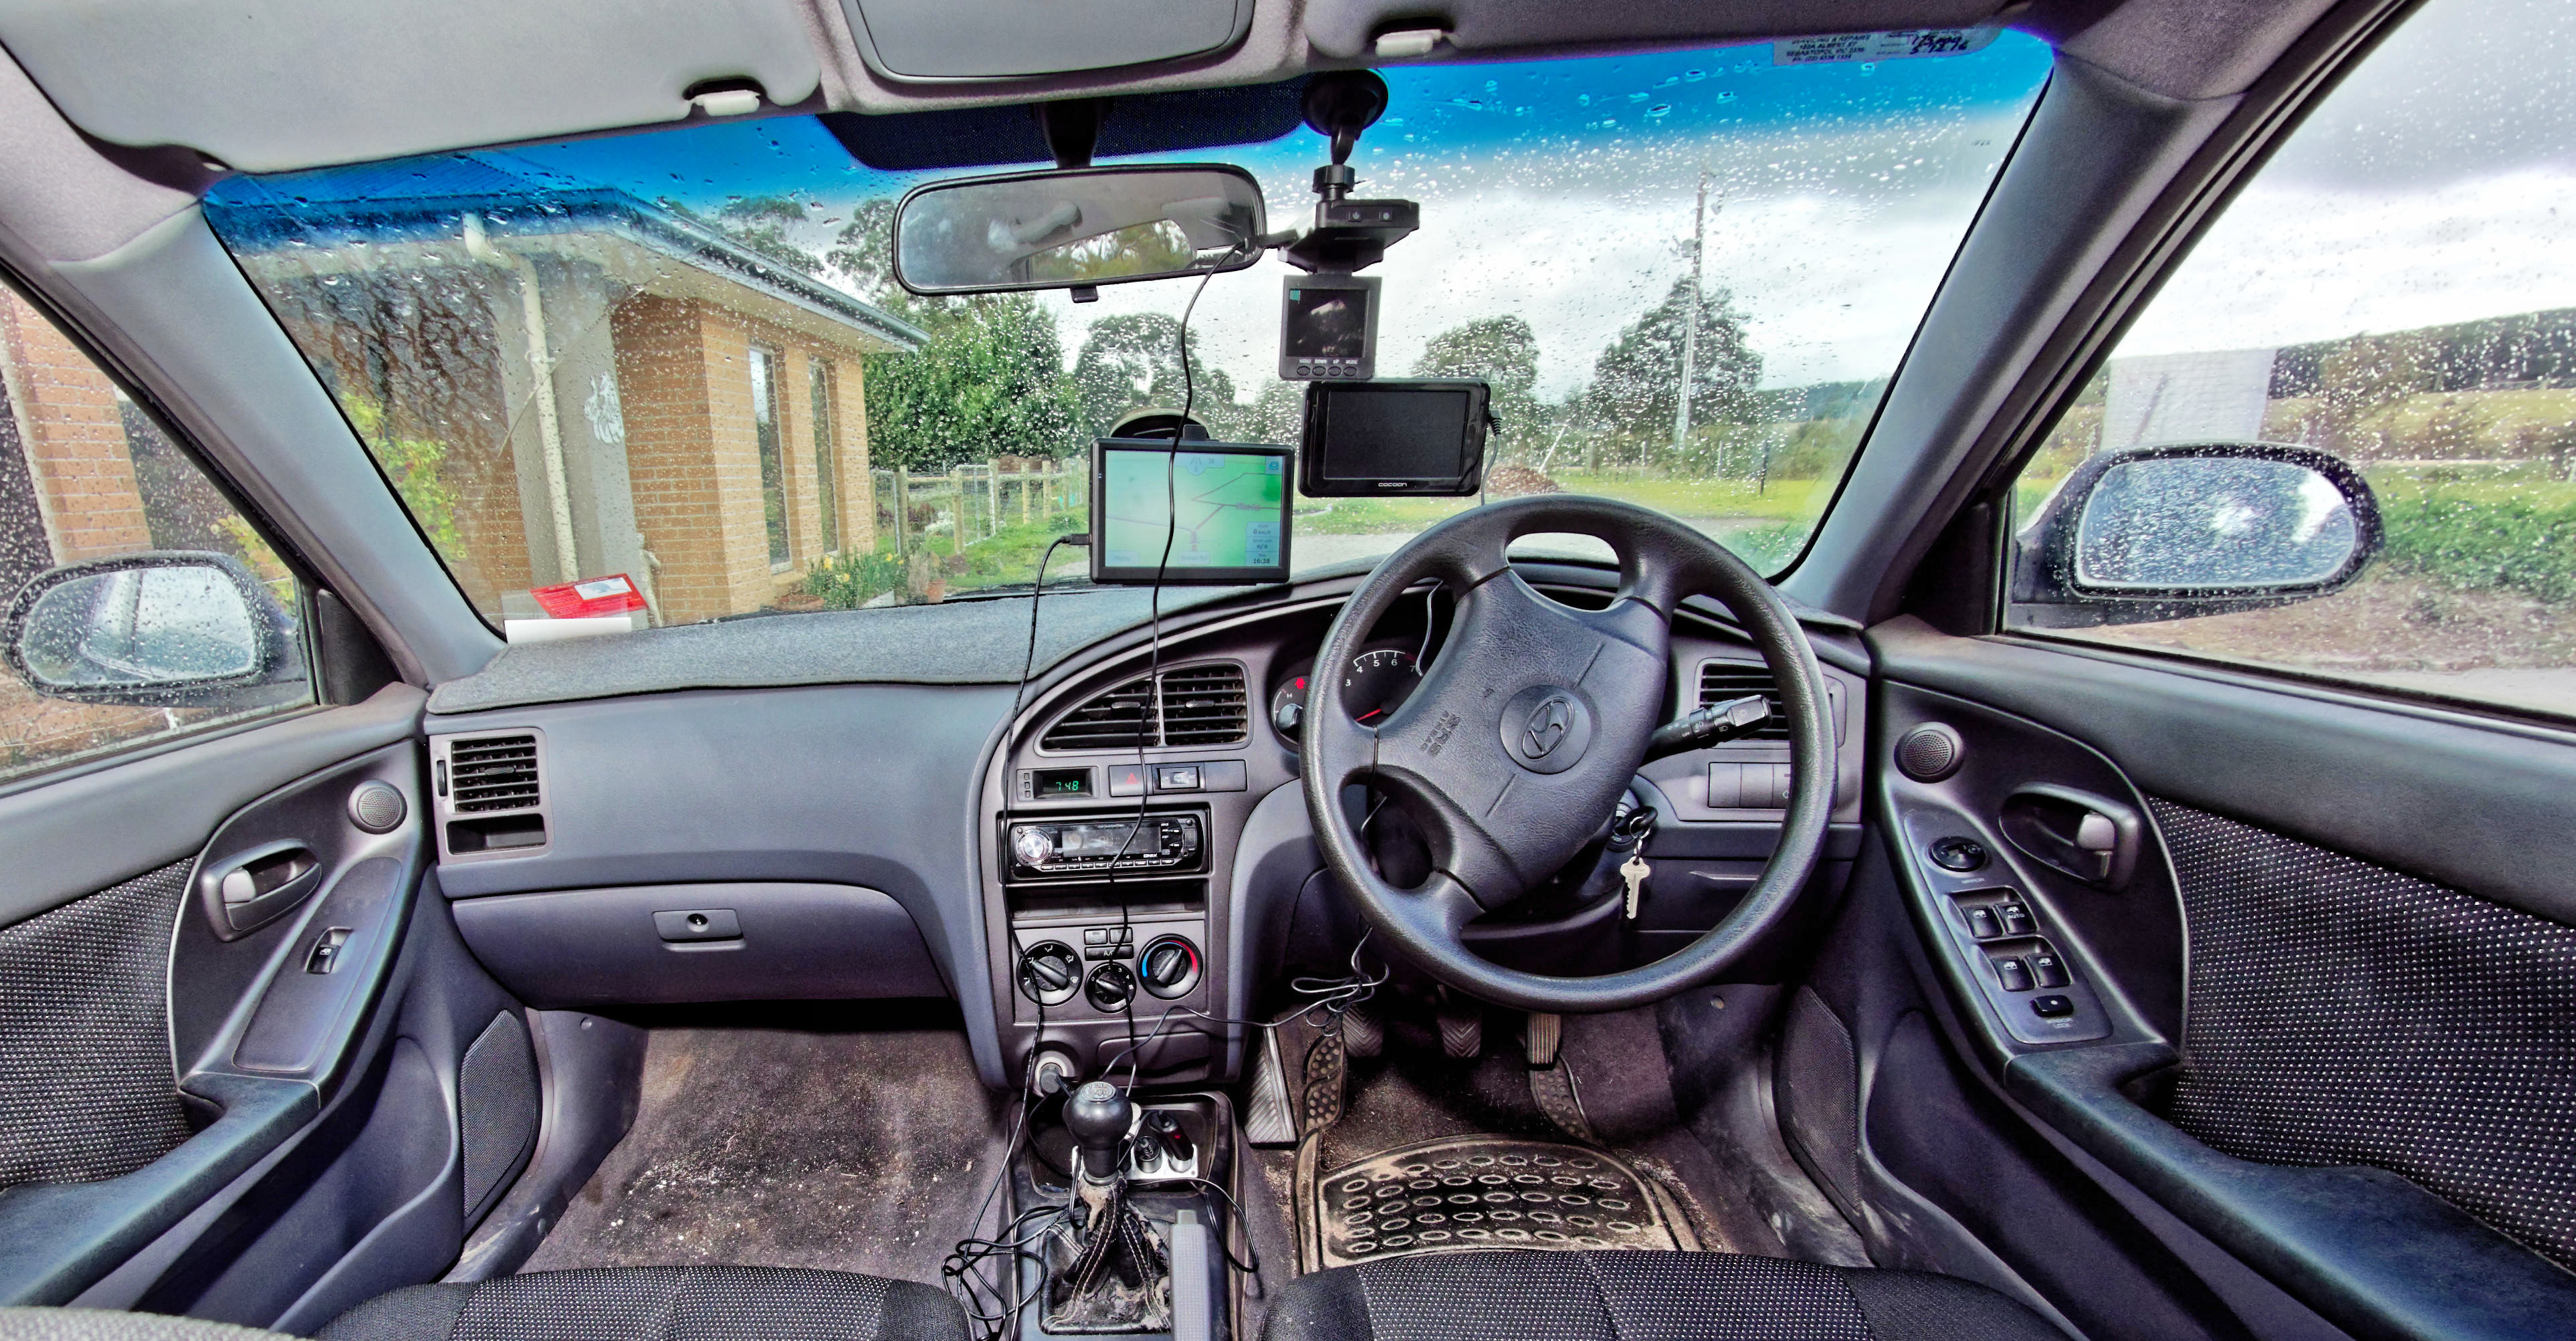 Car-electronics-9.jpeg